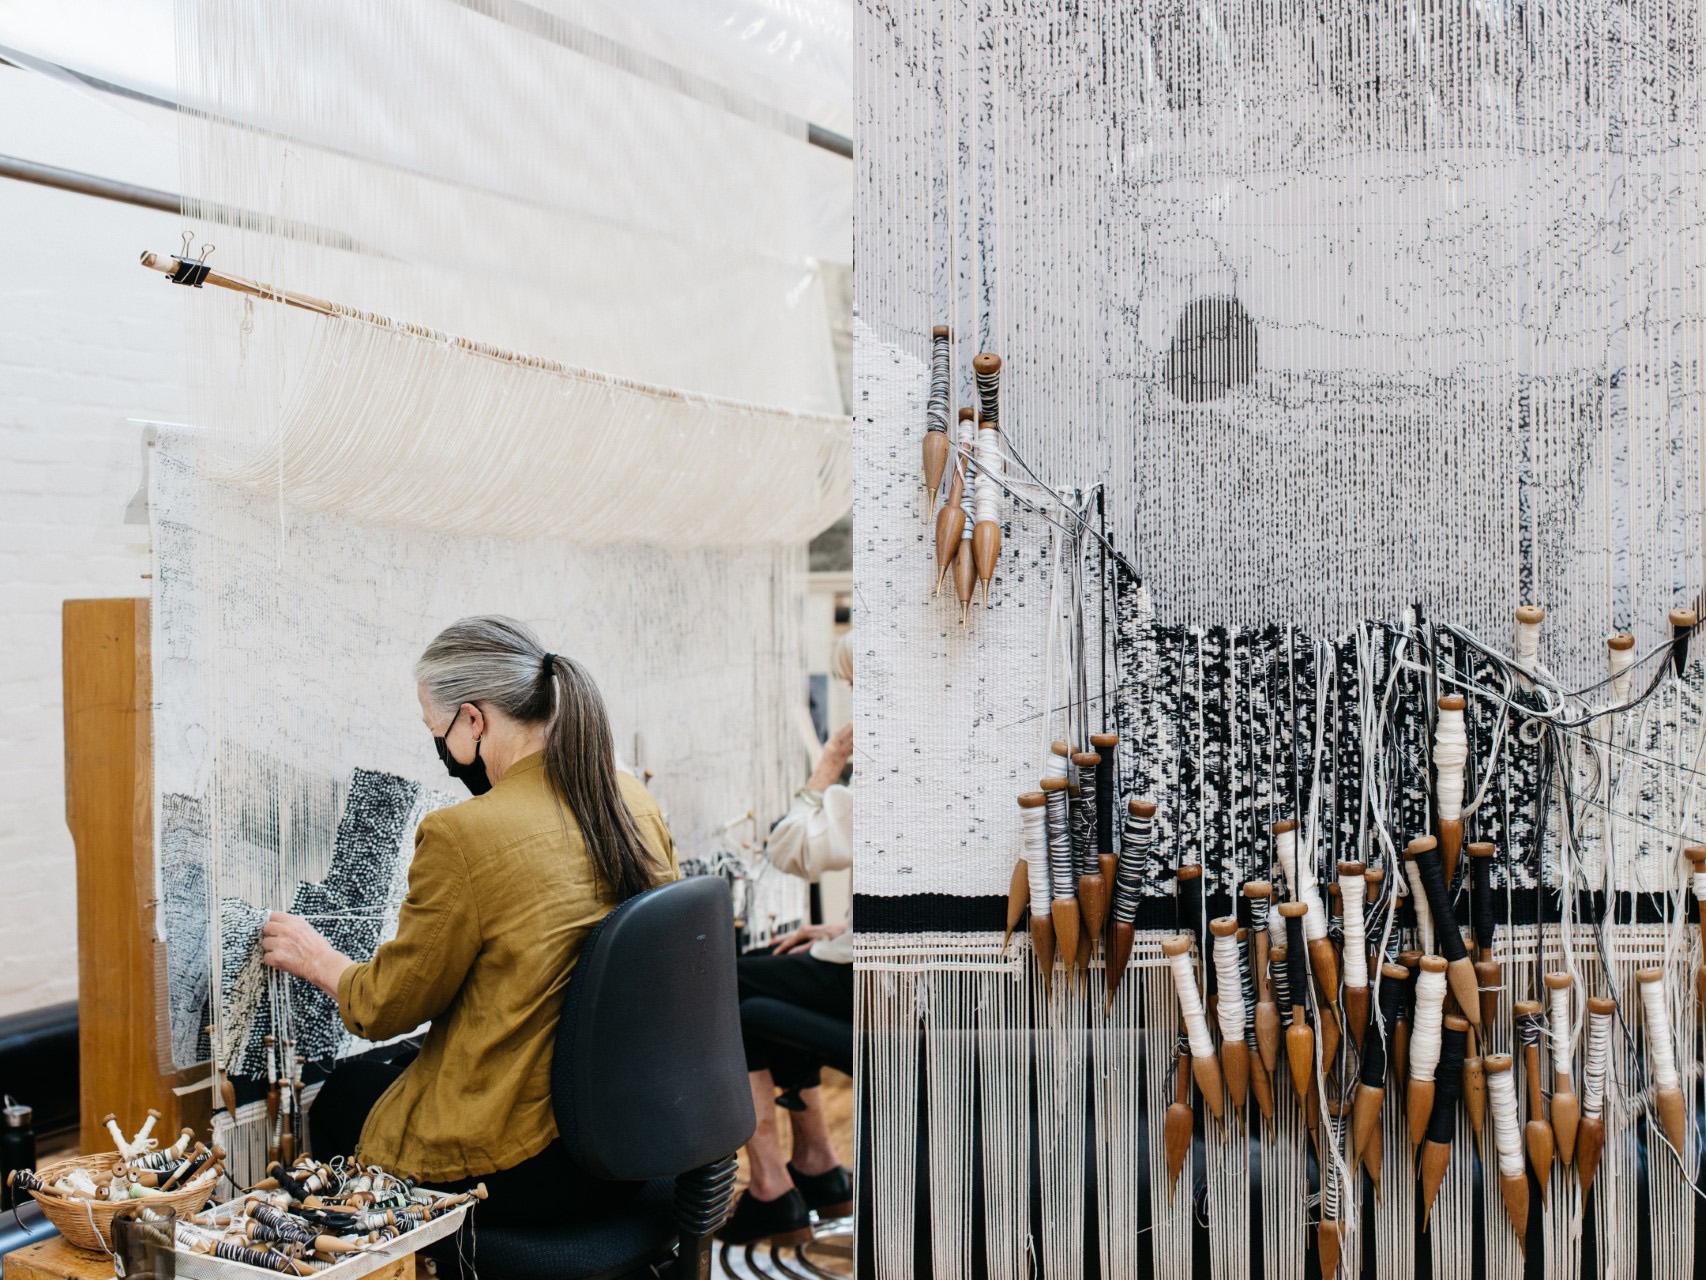 Left to right: ATW weaver Pamela Joyce working on 'Ilpili', designed by Pepai Jangala Carroll in 2021; Close up view of 'Ilpili', 2021, designed by Pepai Jangala Carroll, woven by Pamela Joyce, Chris Cochius & Cheryl Thornton. Photos: Marie-Luise Skibbe.